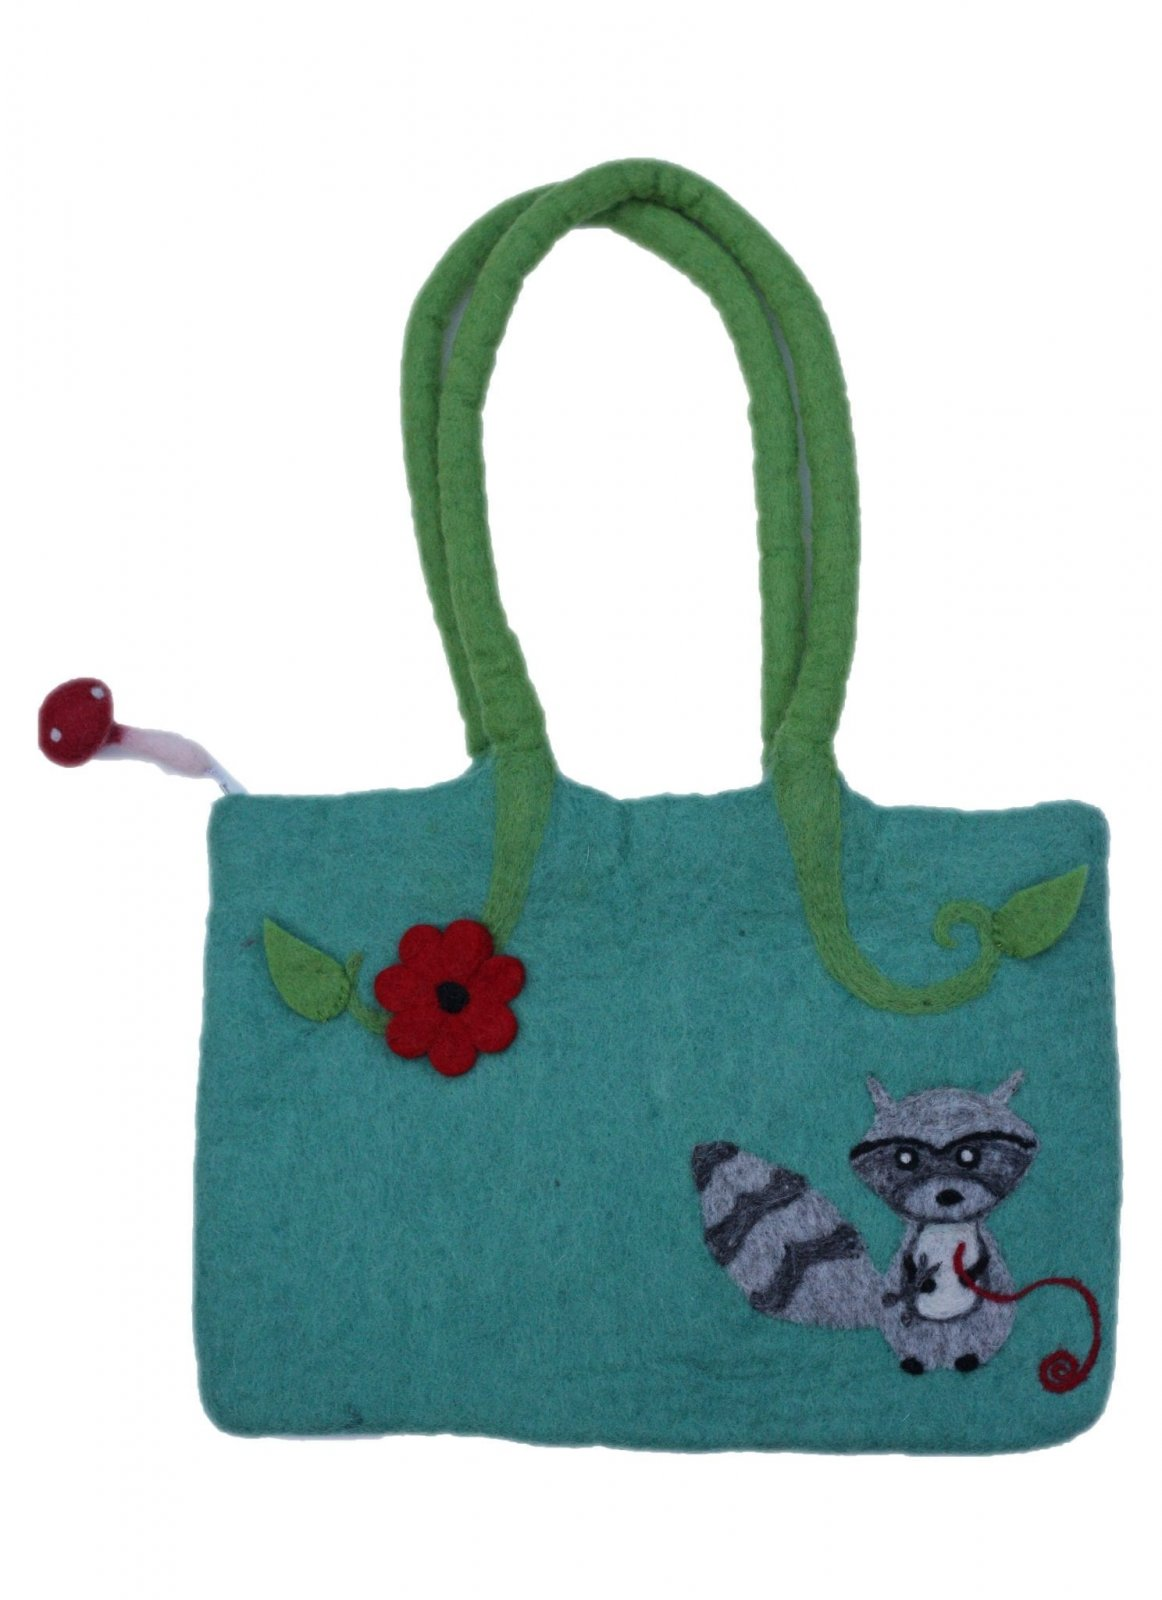 Frabjous Fibers Woodland Creatures Felted Knitting Bag